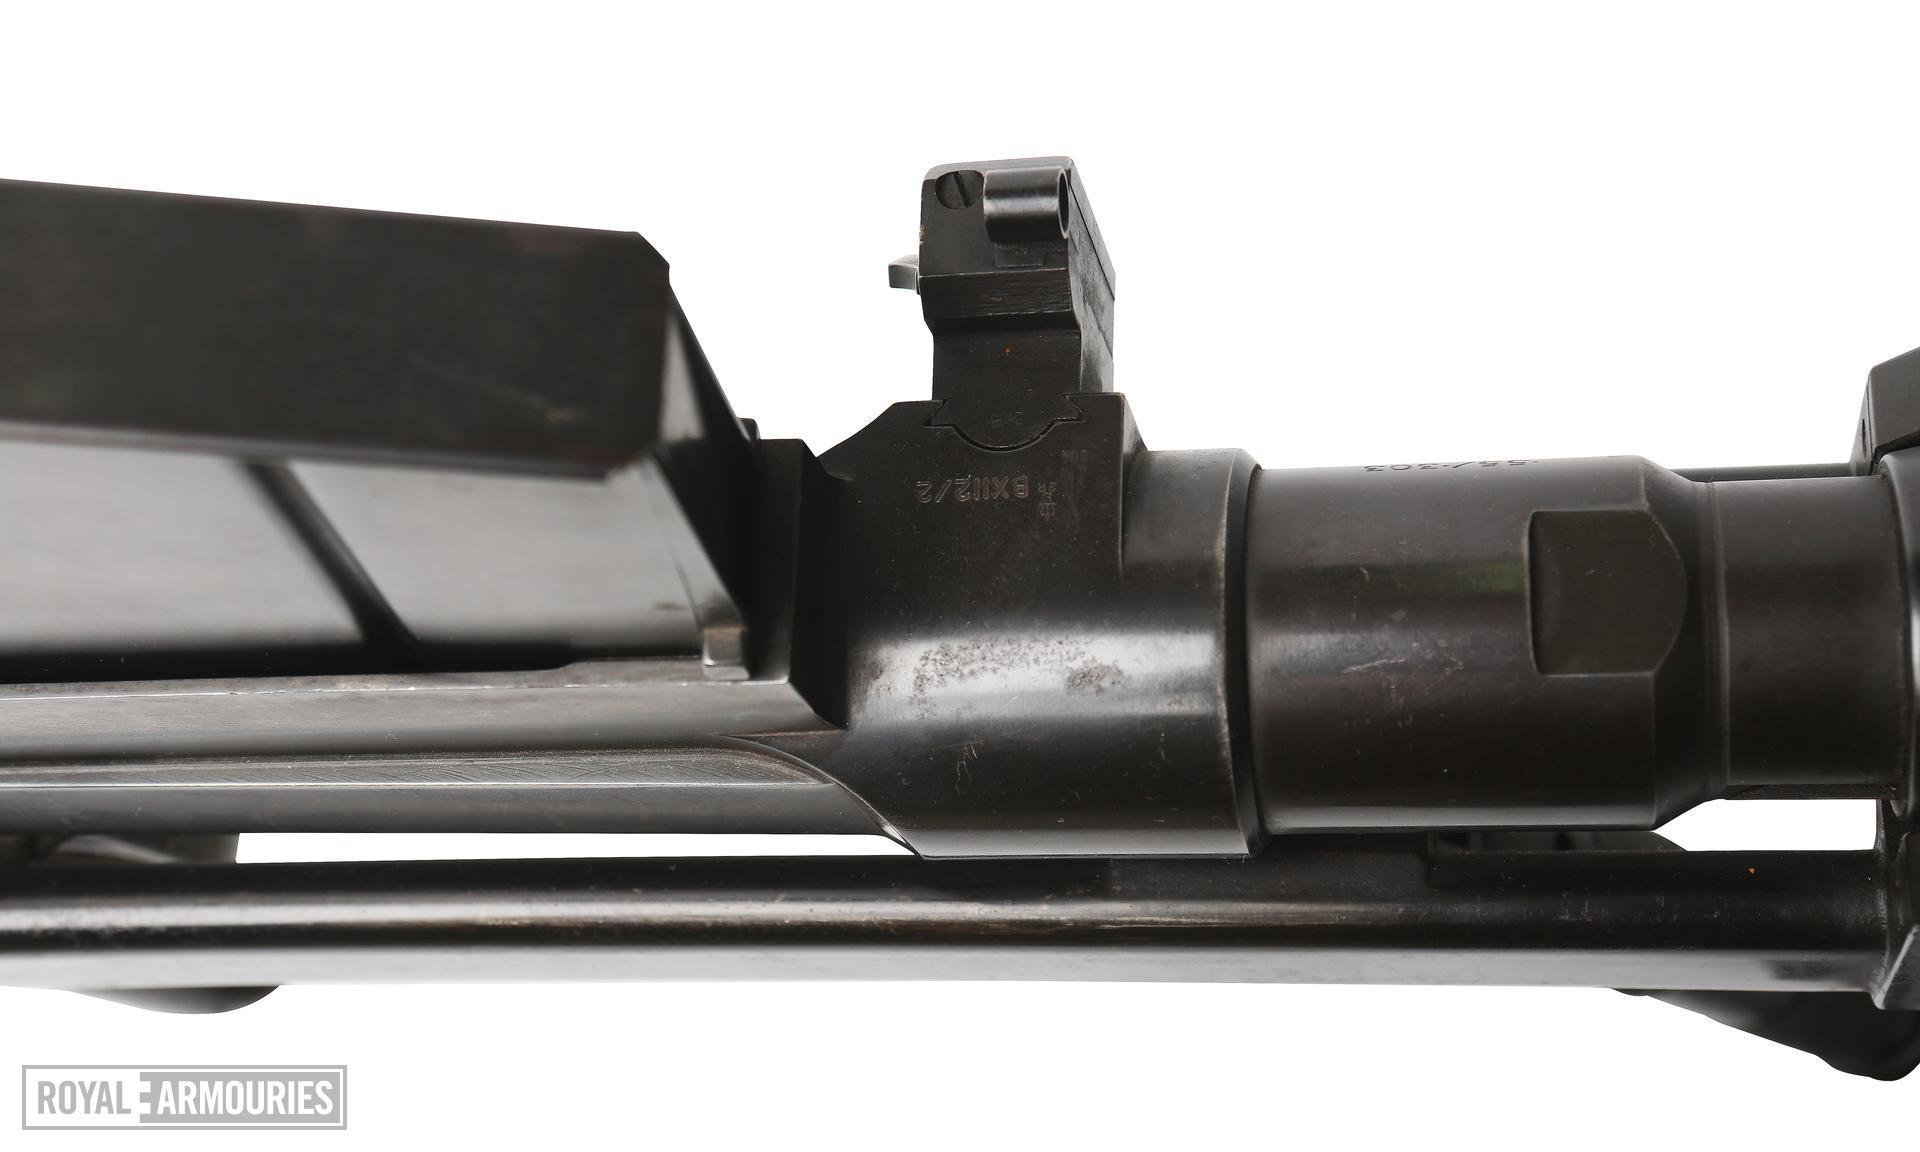 PR.1723- Centrefire bolt-action training rifle Experimental training model